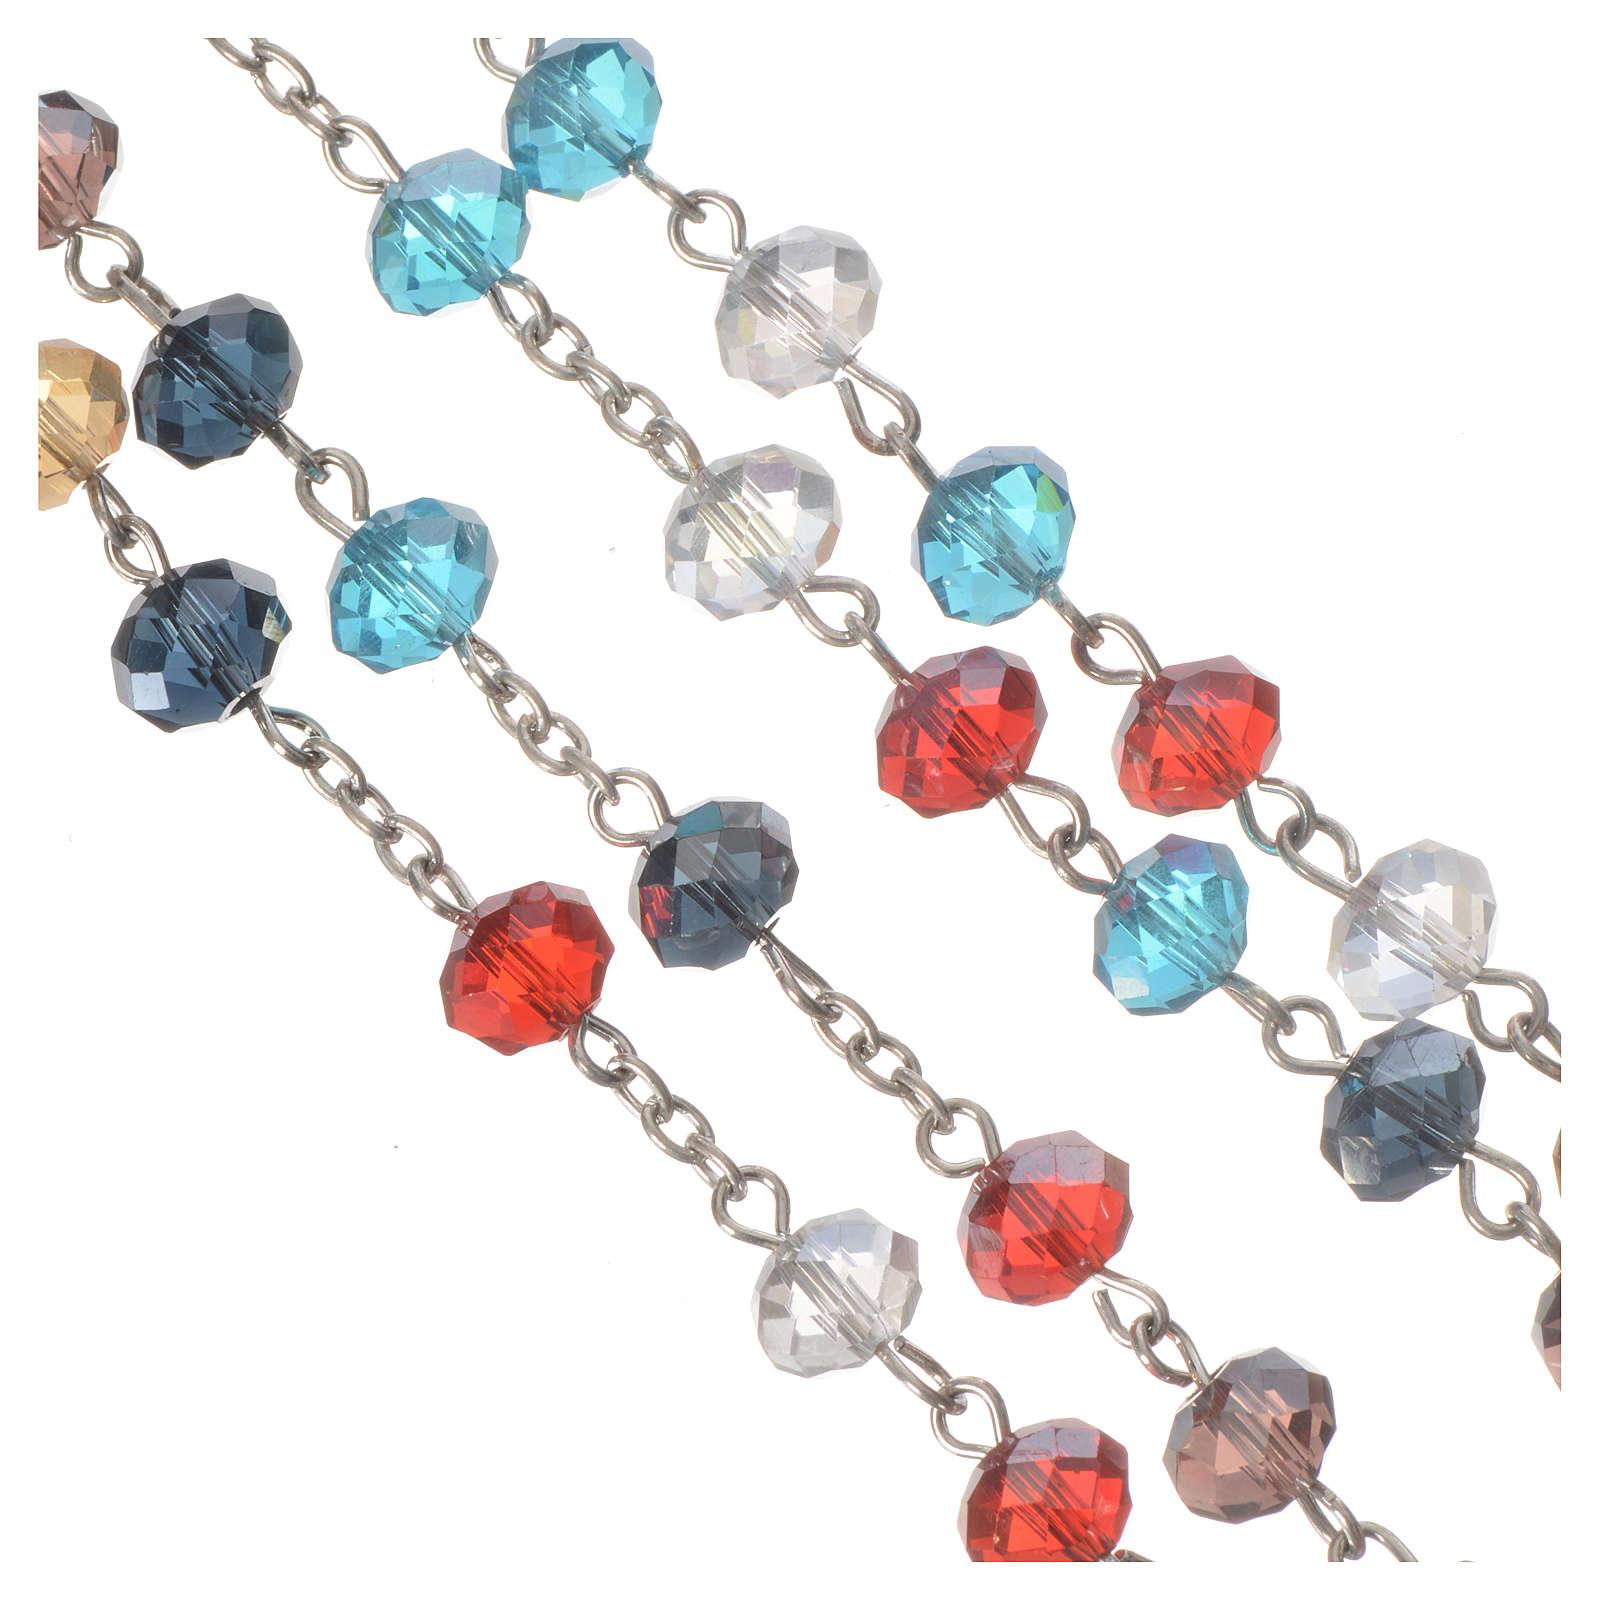 Chapelet en perles cristal multicolore 8x6mm 4